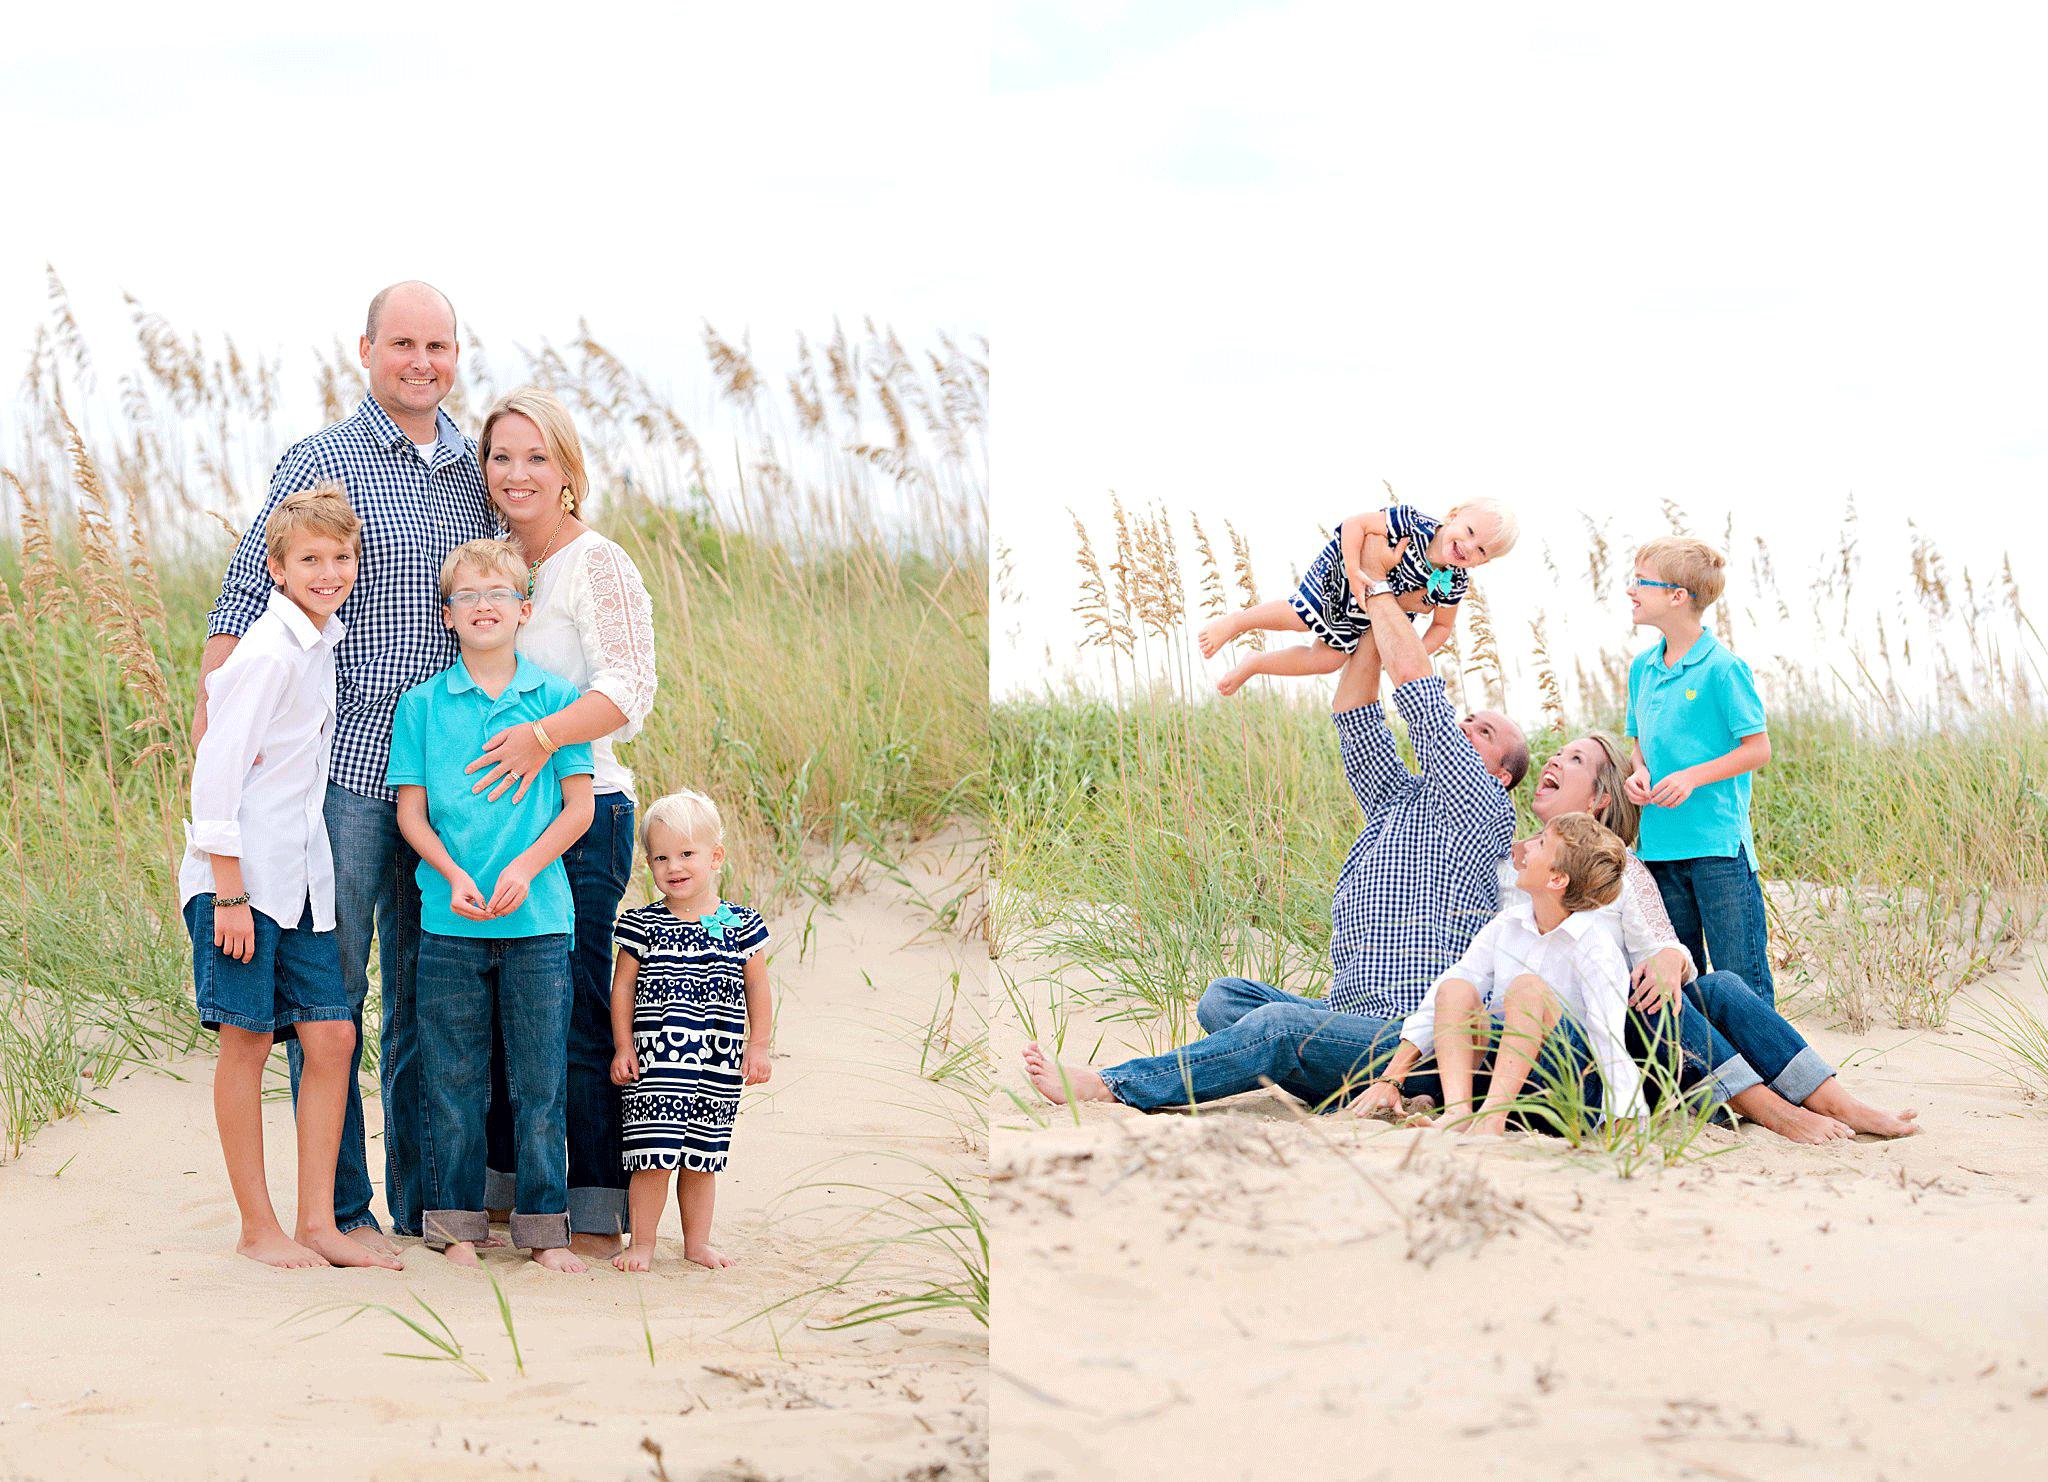 family-photographers-virginia-beach-sandbridge-norfolk-chesapeake-best-photographer-melissa-bliss-photography.png